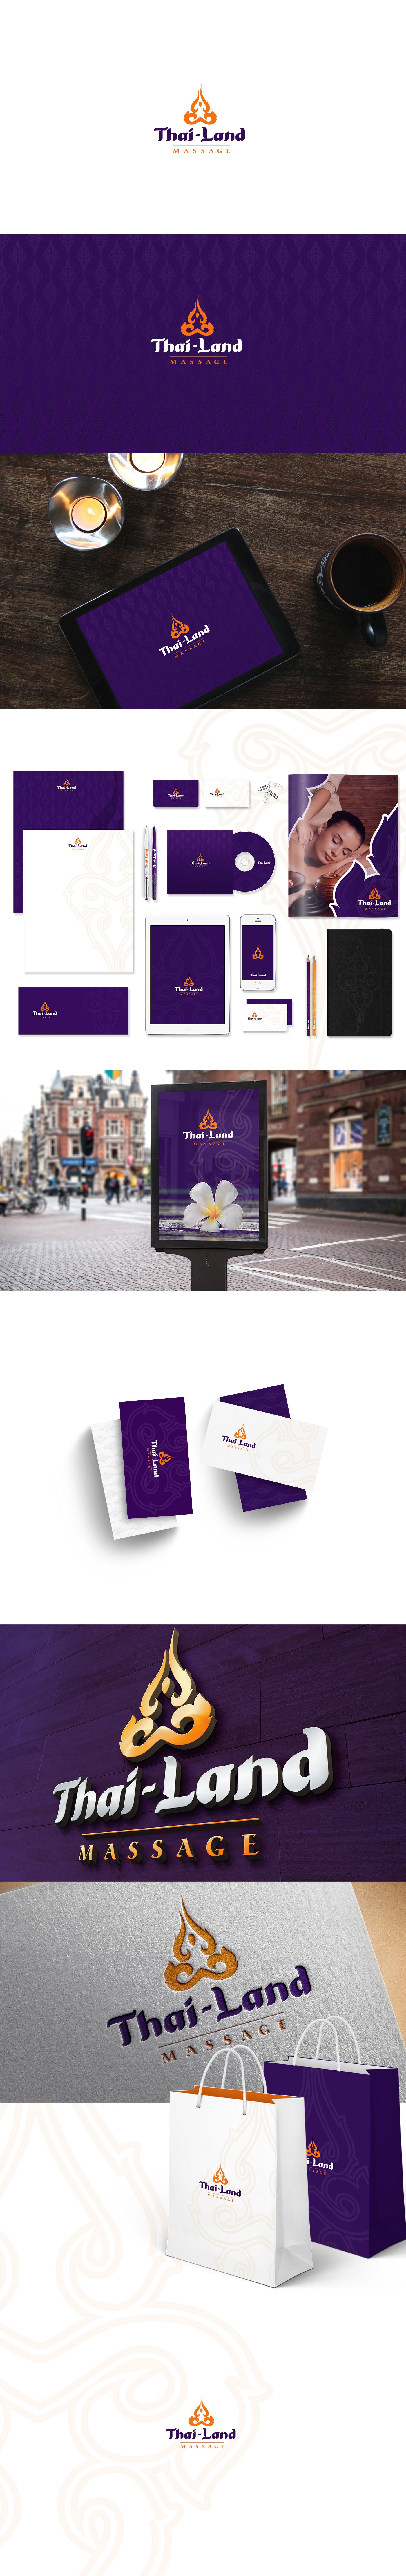 redesign rebranding logo Corporate Identity massage thai massage